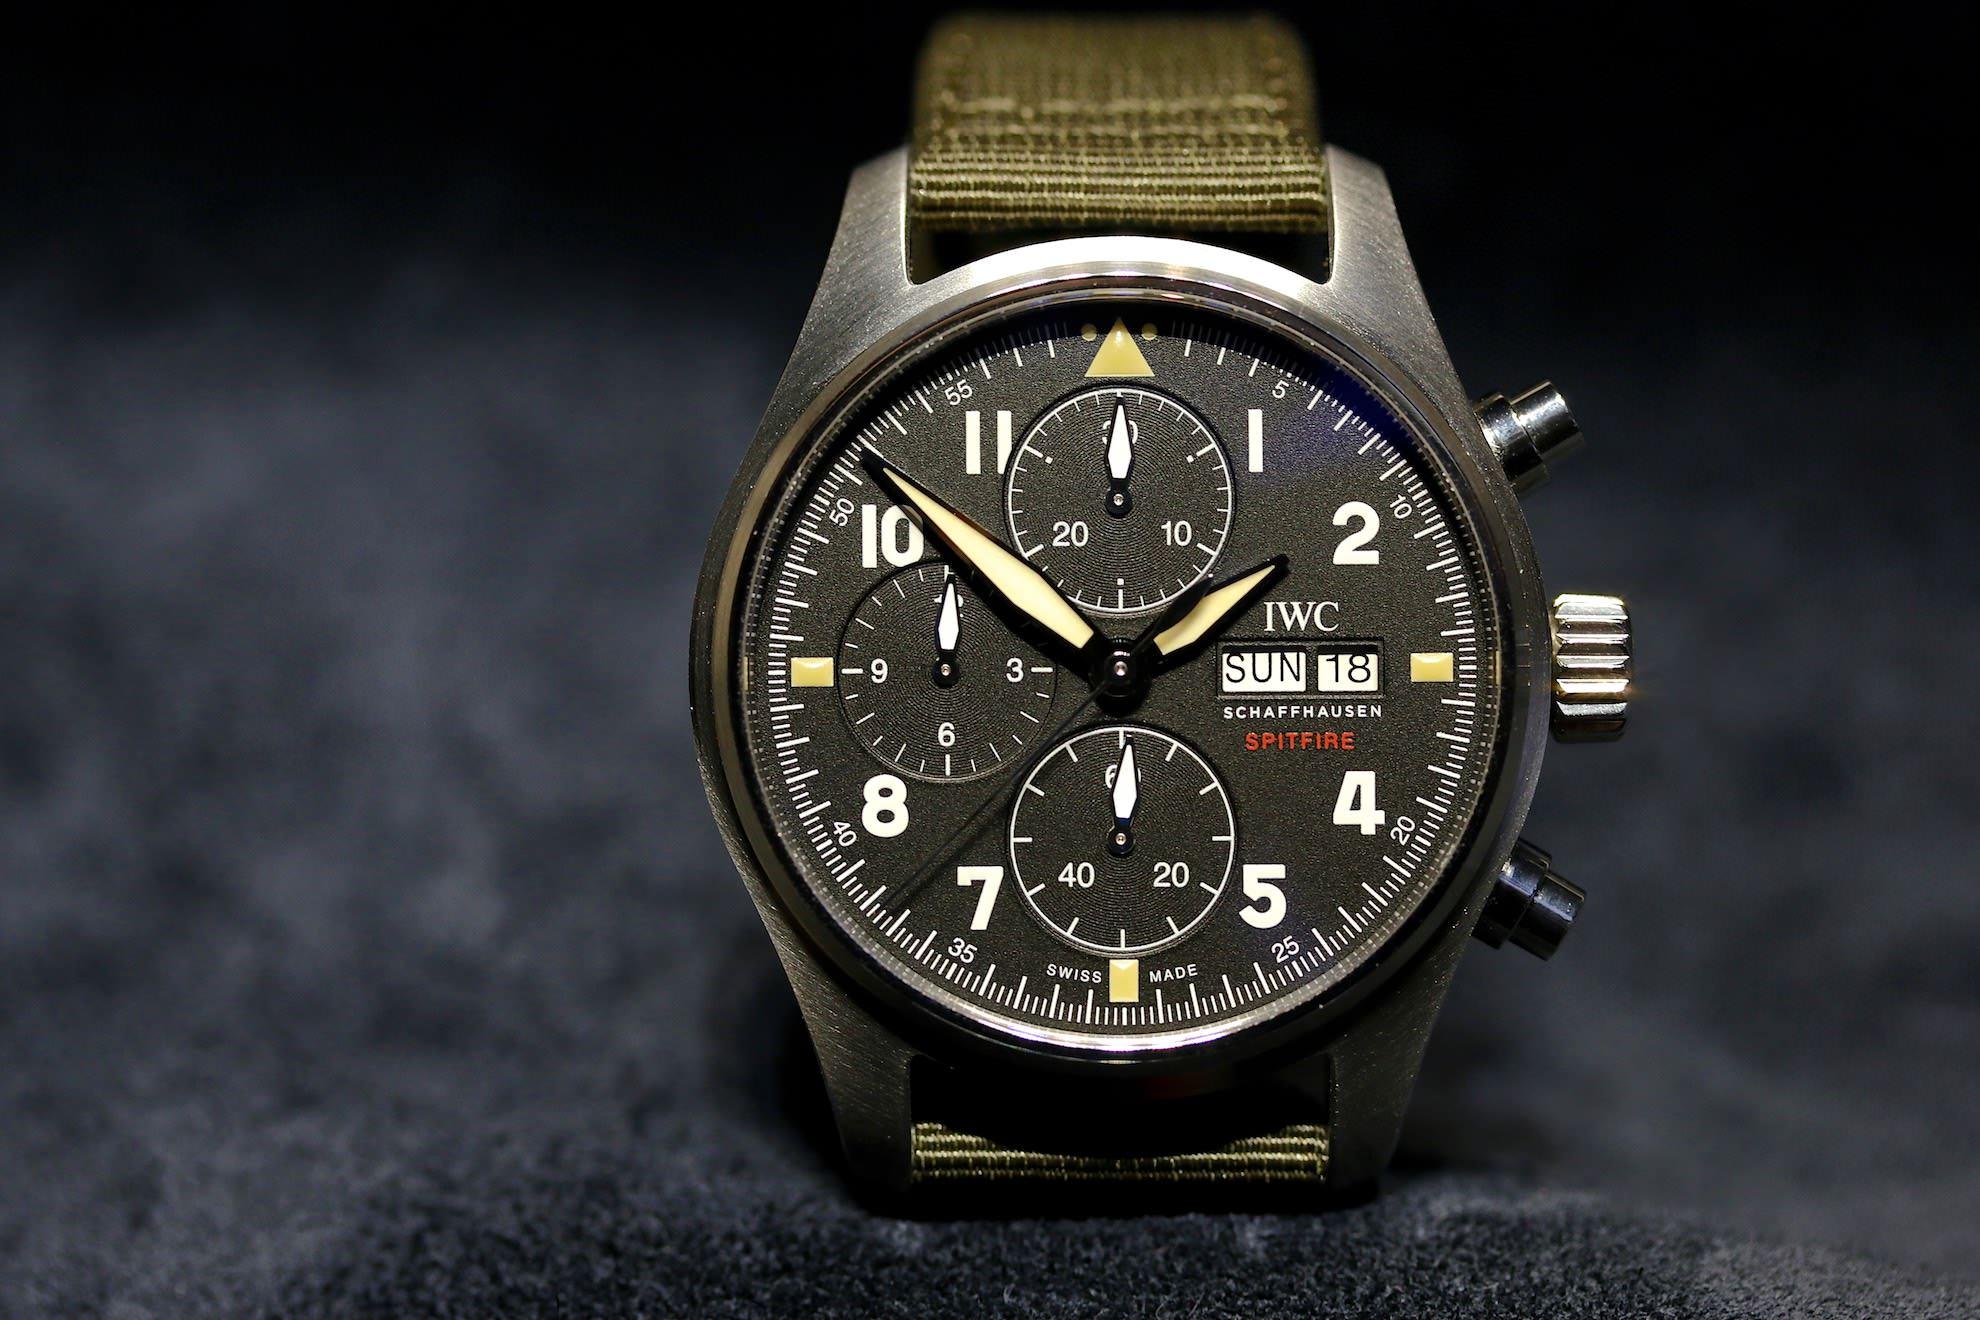 IWC_Pilots_Watch_Chronograph_Spitfire_1